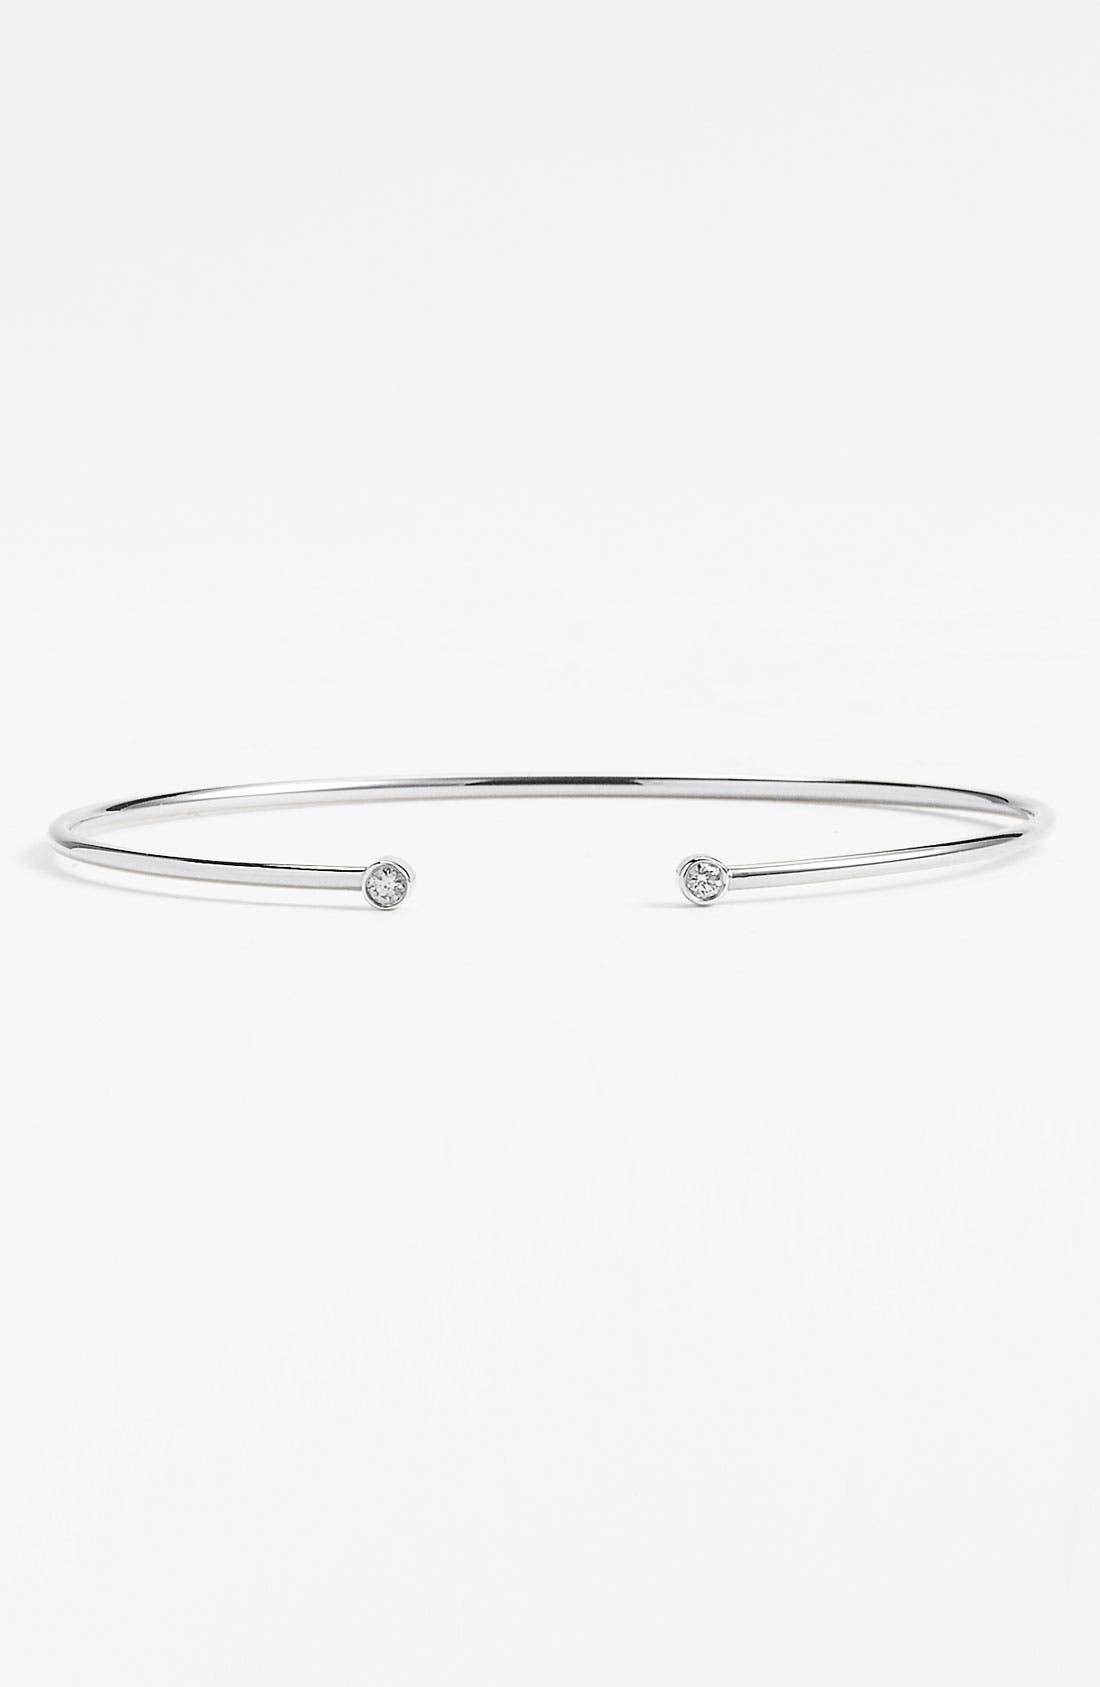 Main Image - Lana Jewelry 'Echo' Diamond Cap Bracelet